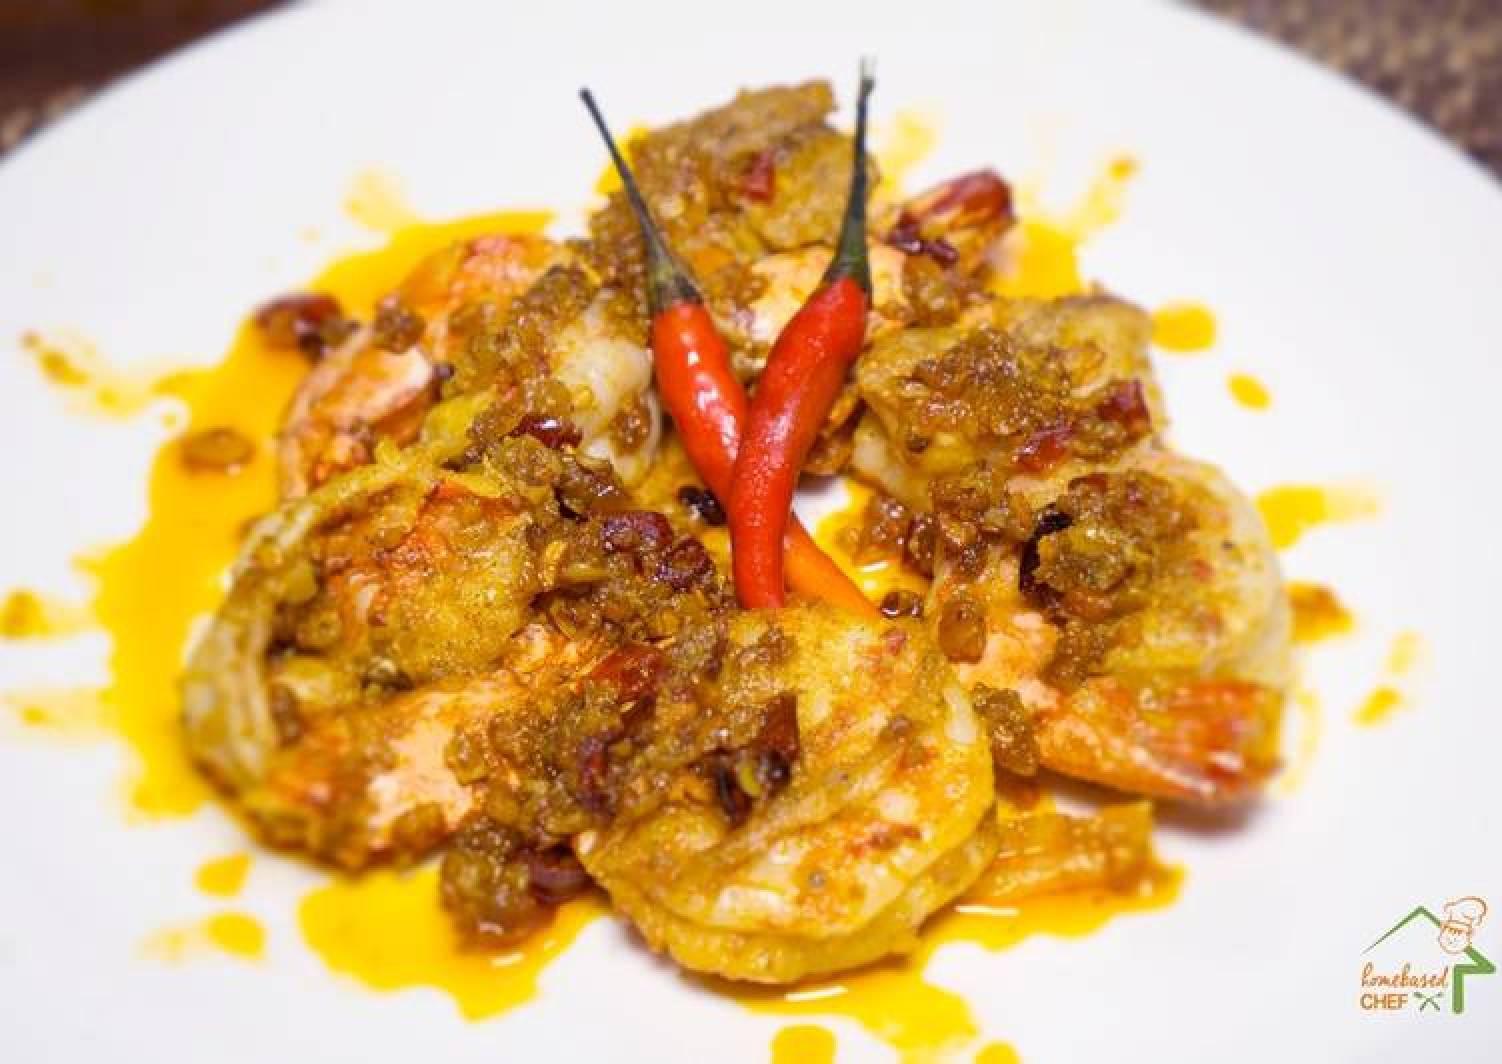 Chili Garlic Prawns (Mild Spicy Gambas)